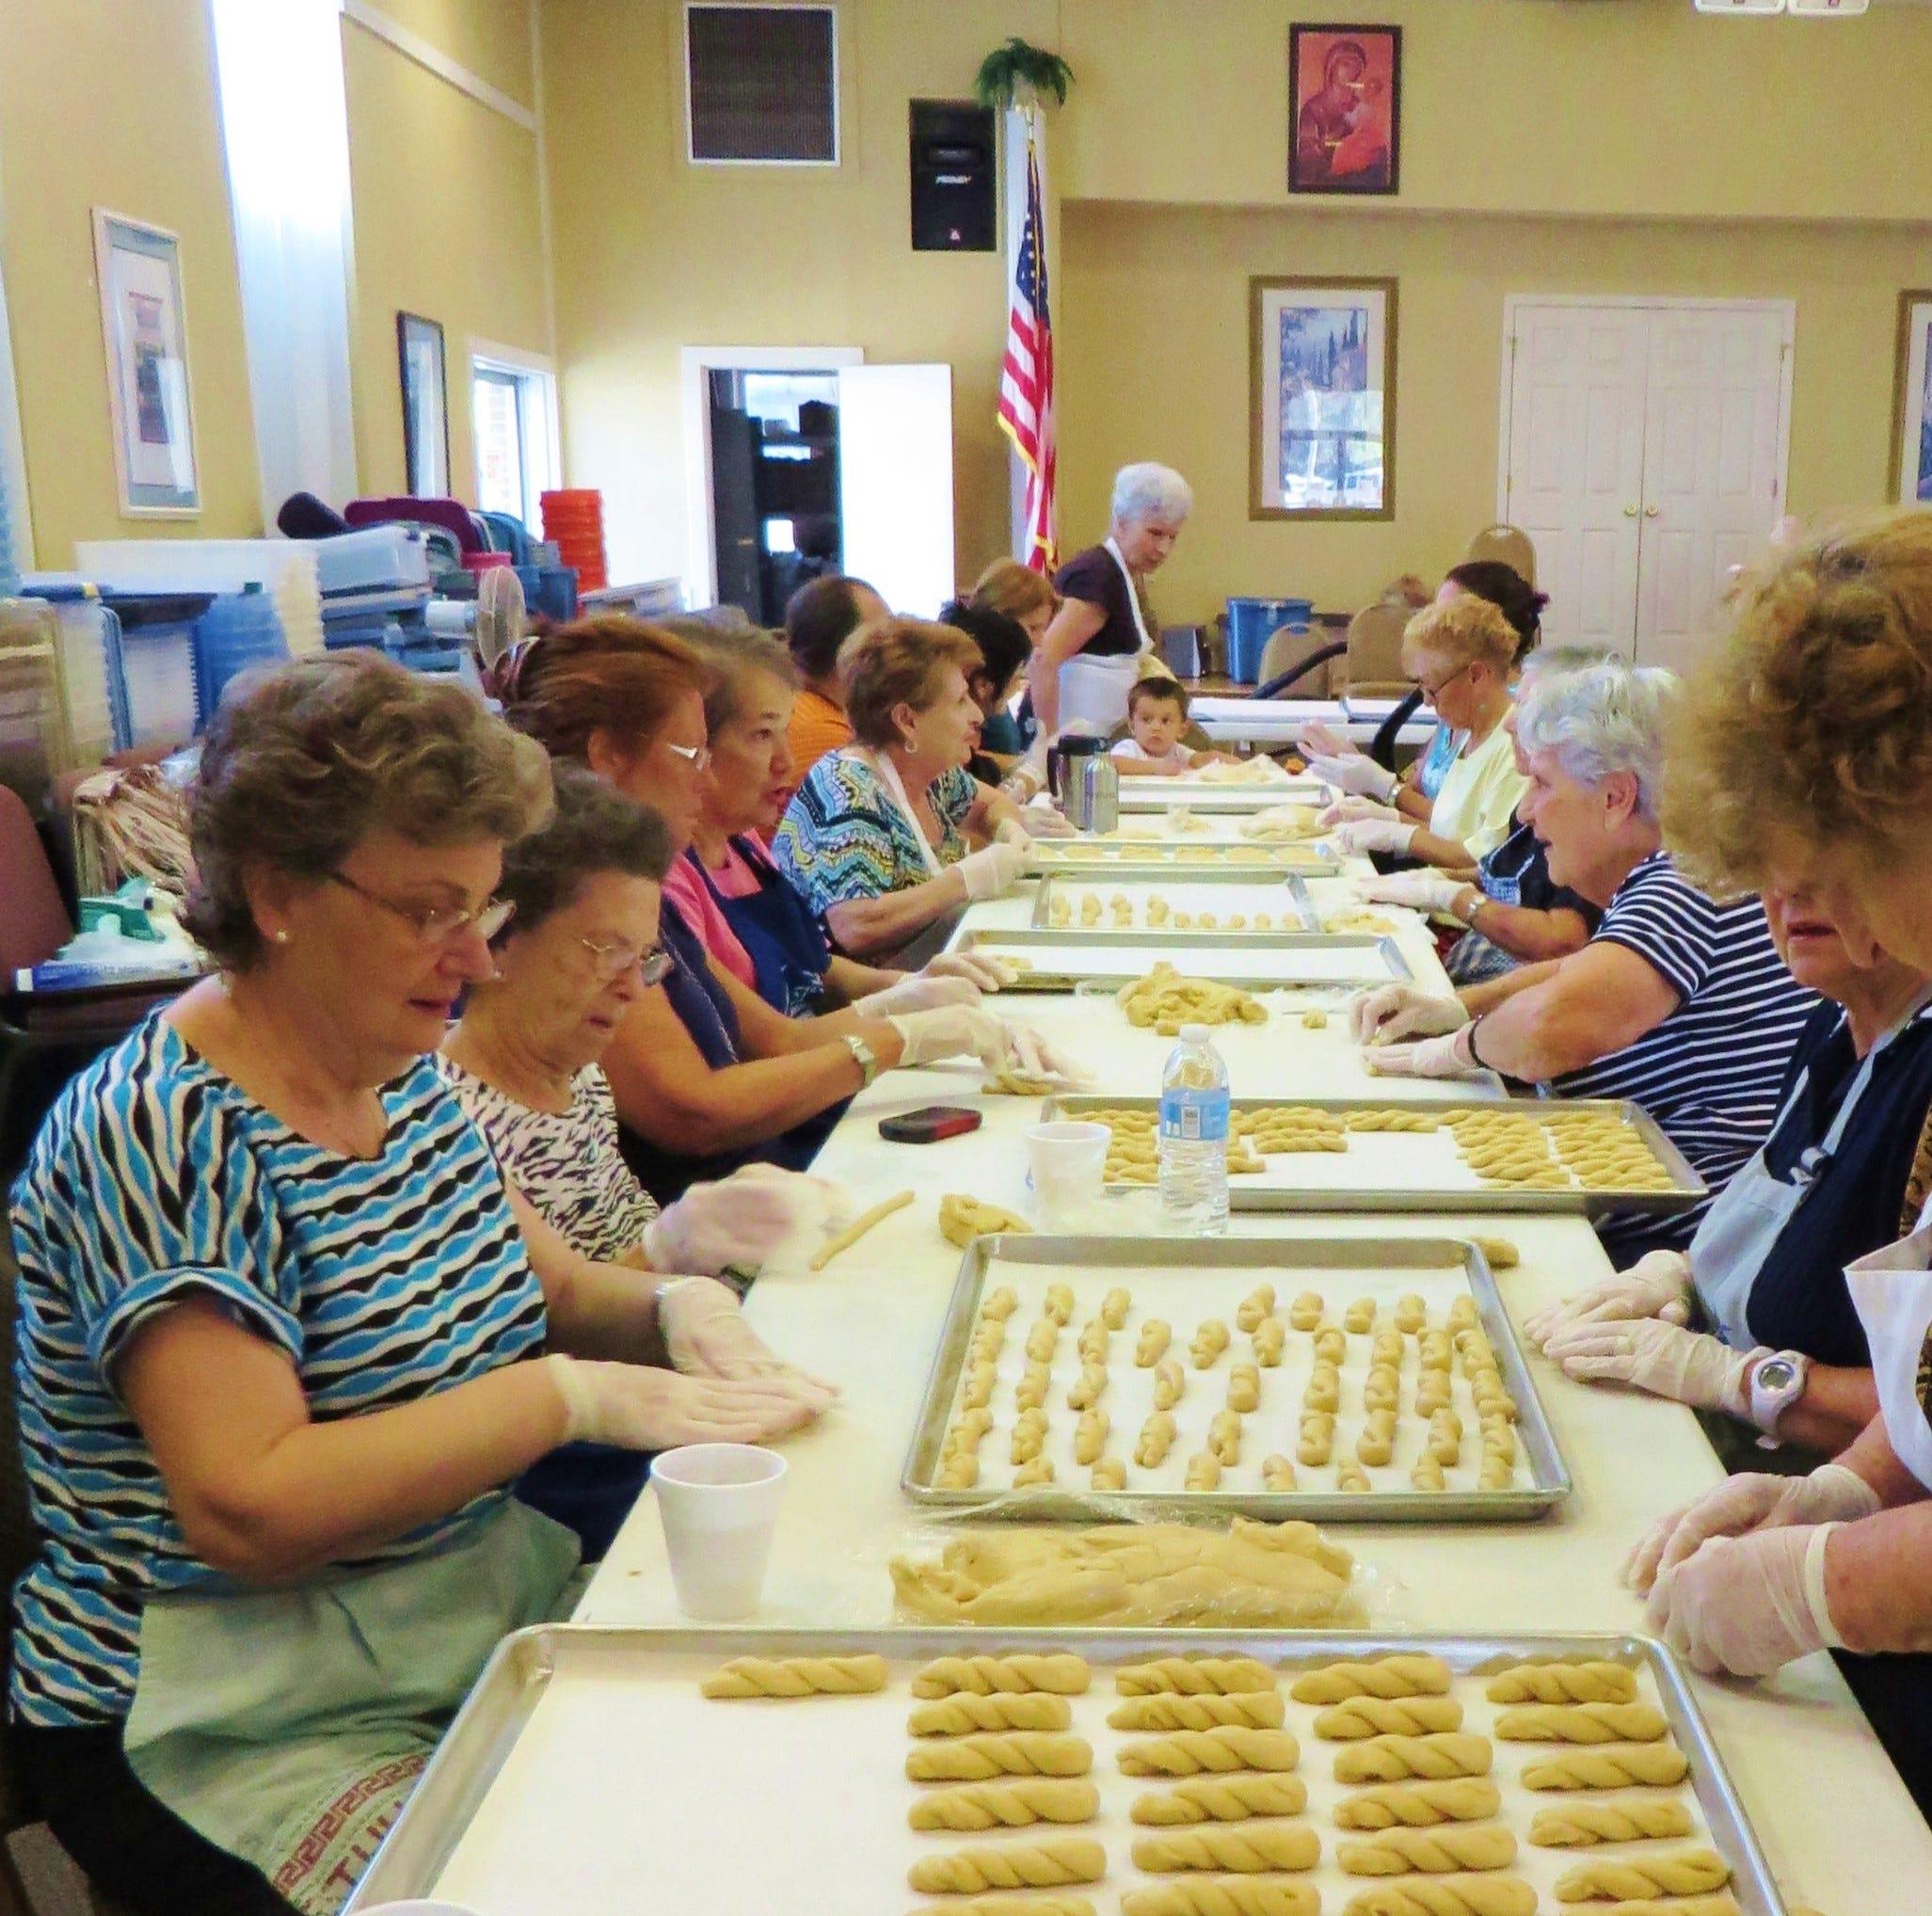 Pensacola's big, fat Greek Festival stuffed full of hospitality, yummy delicacies